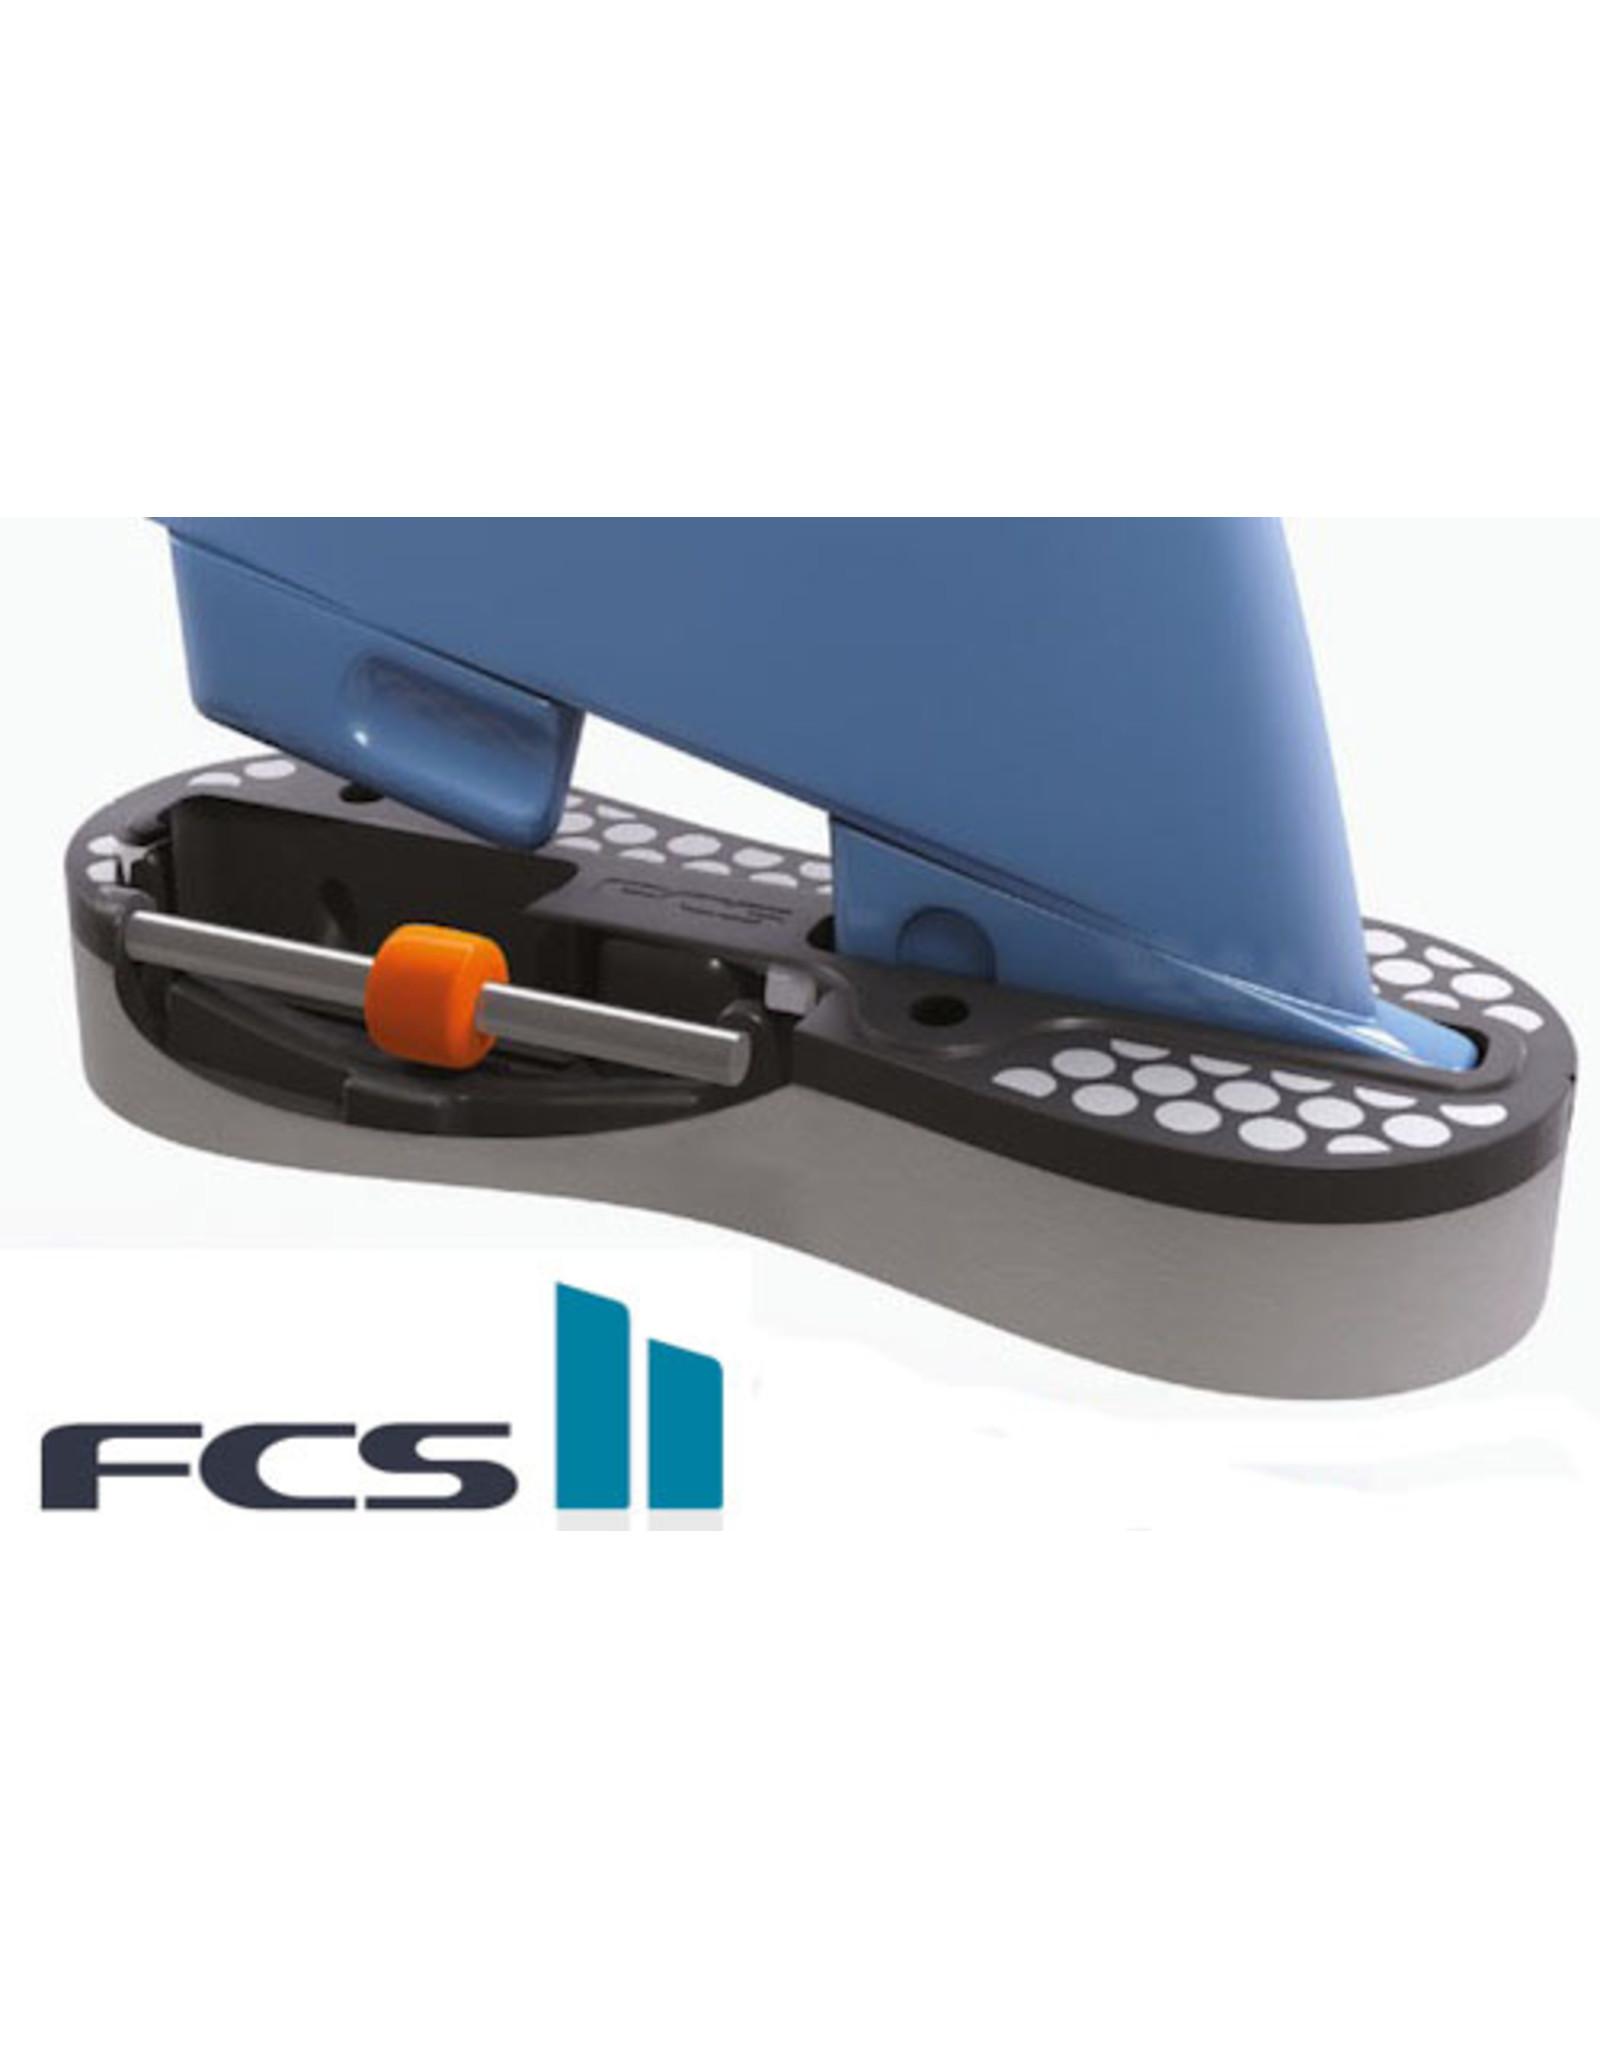 FCS FCSII - Center Plug (199.-)